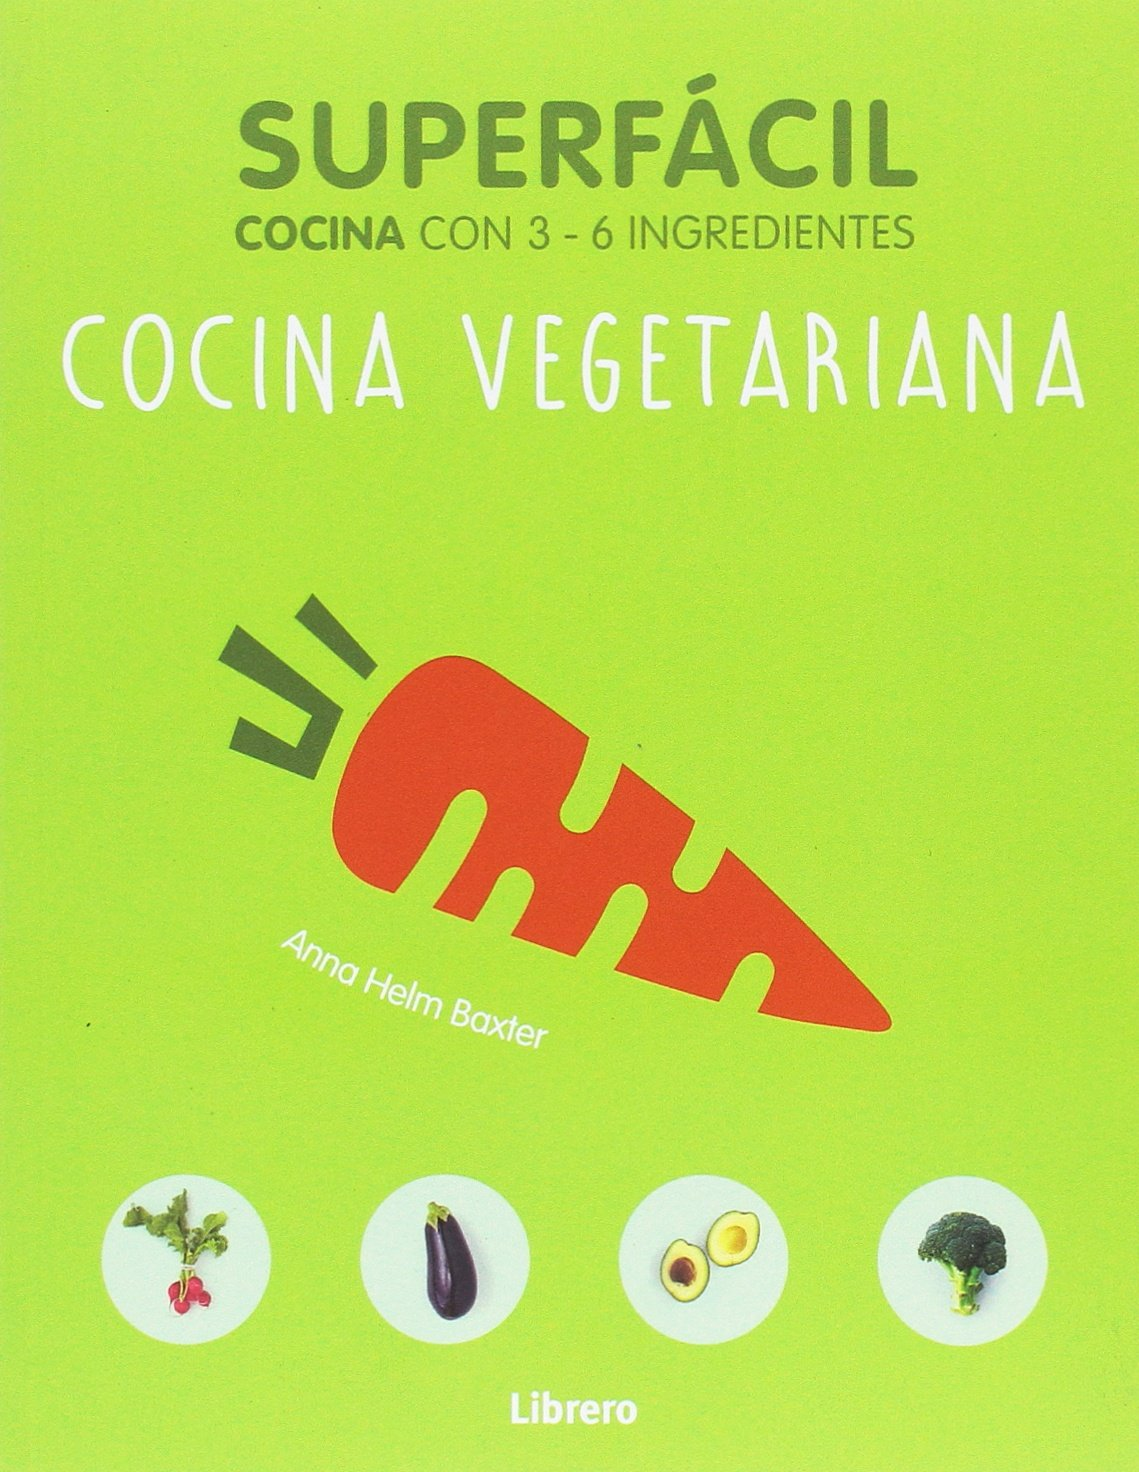 Cocina Vegetariana Anna Baxter 9789089988508 Amazoncom